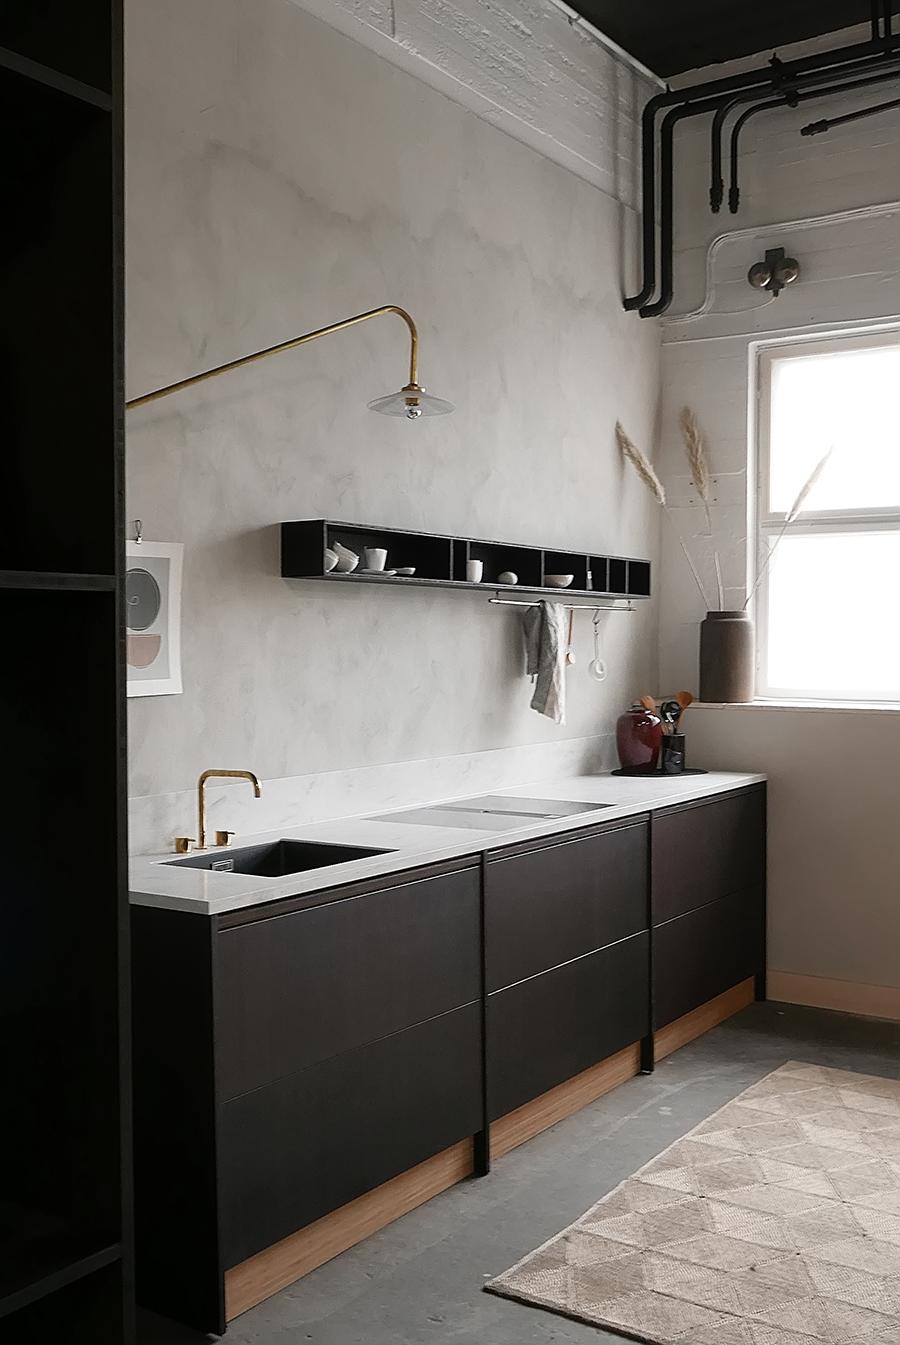 Kitchen design home pinterest showroom kitchen showrooms and